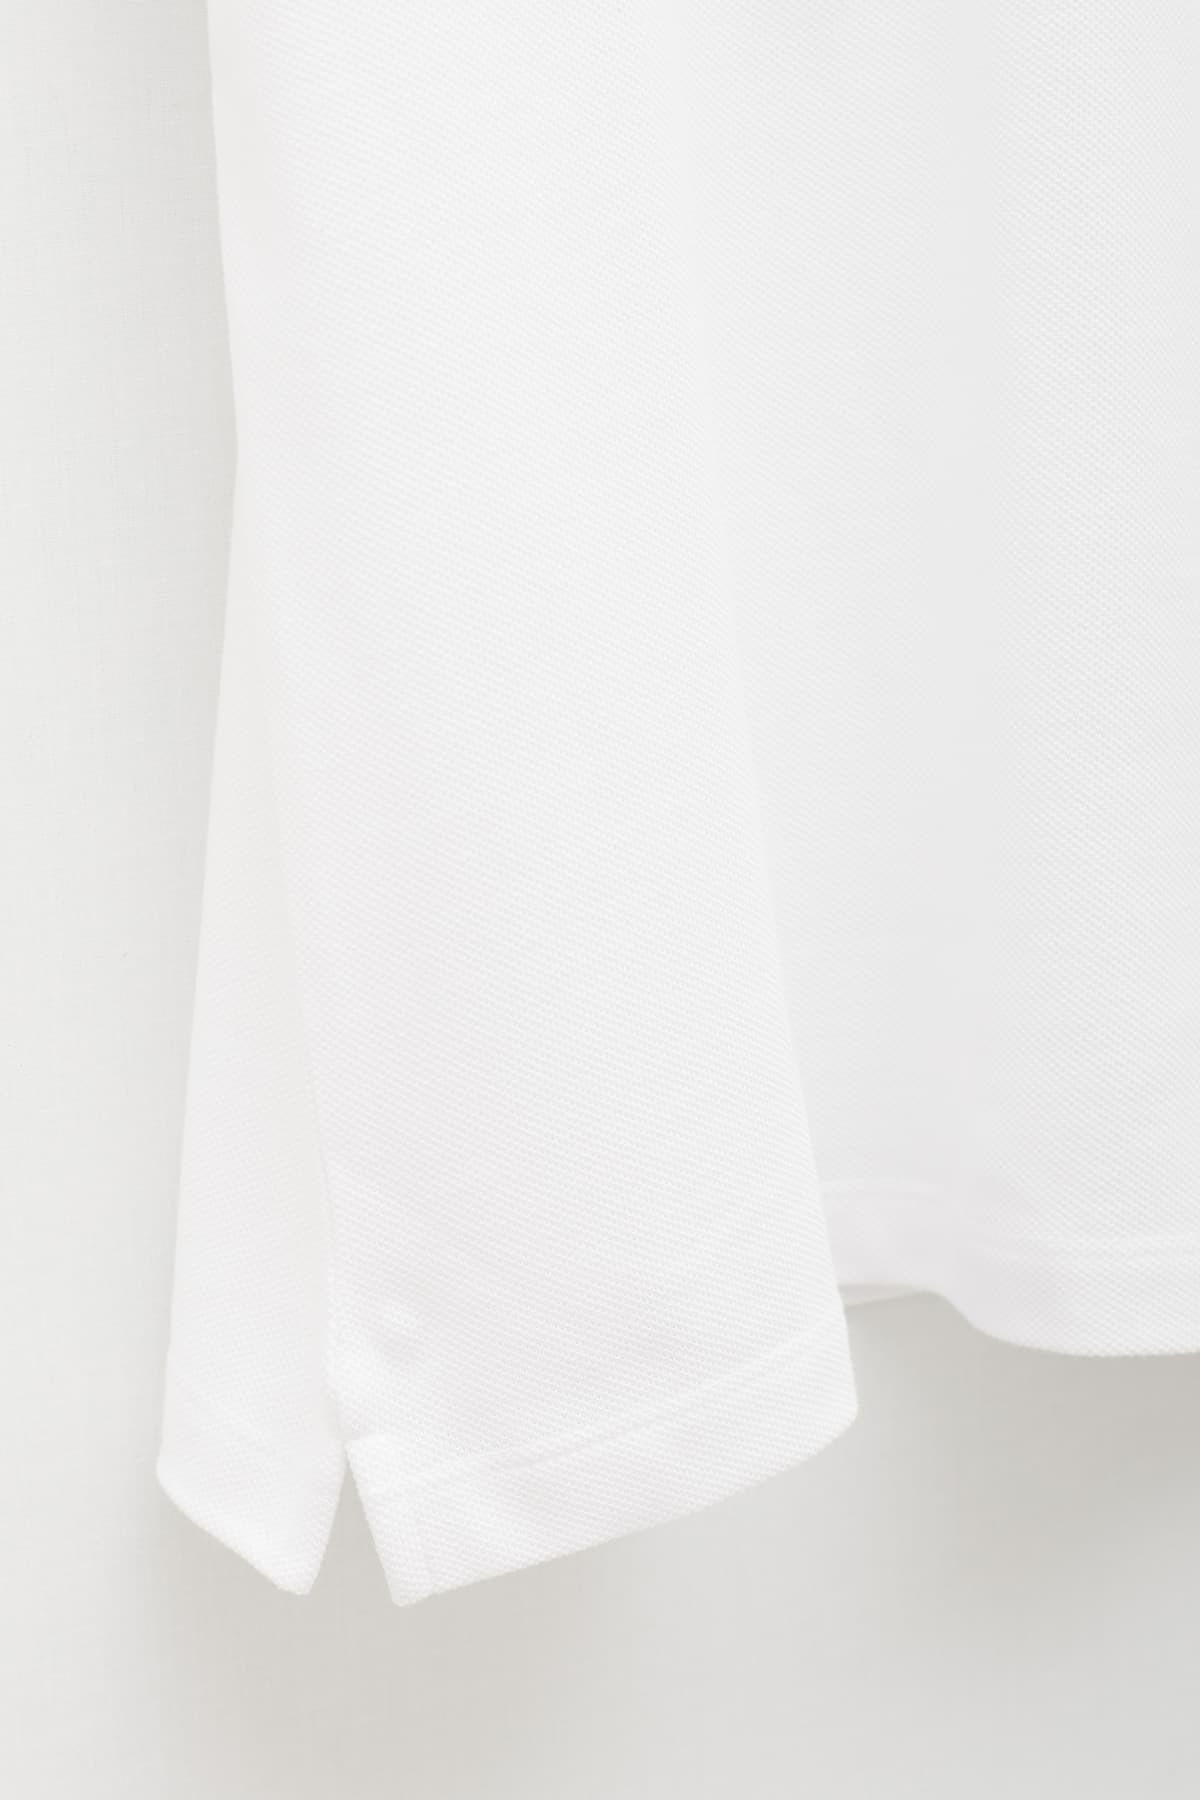 Comprar Sunnei Yellow Blue Peso Bag